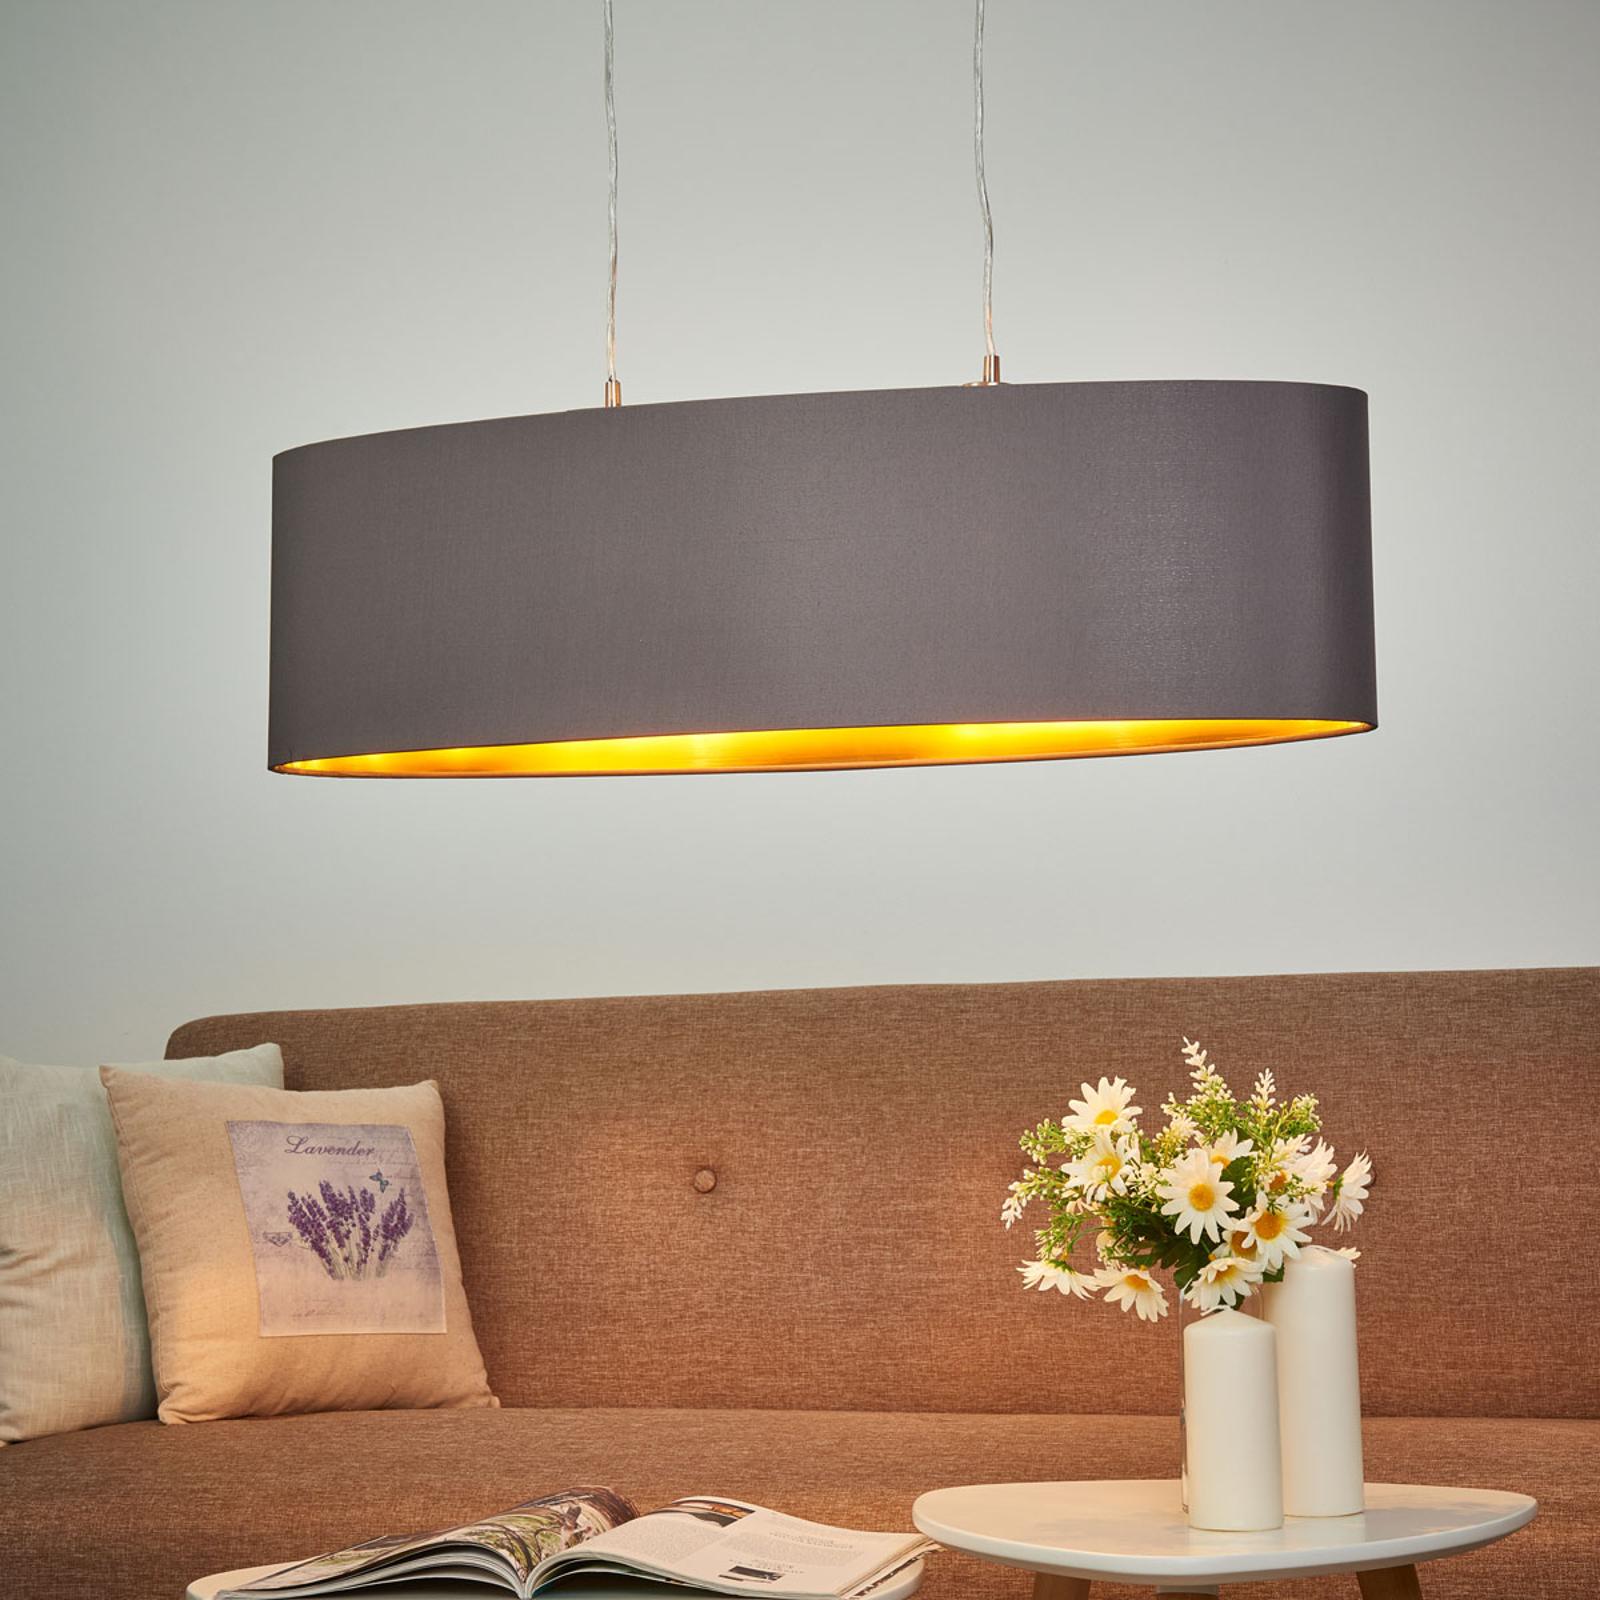 Maserlo fabric hanging light oval cappuccino 78cm_3031703_1